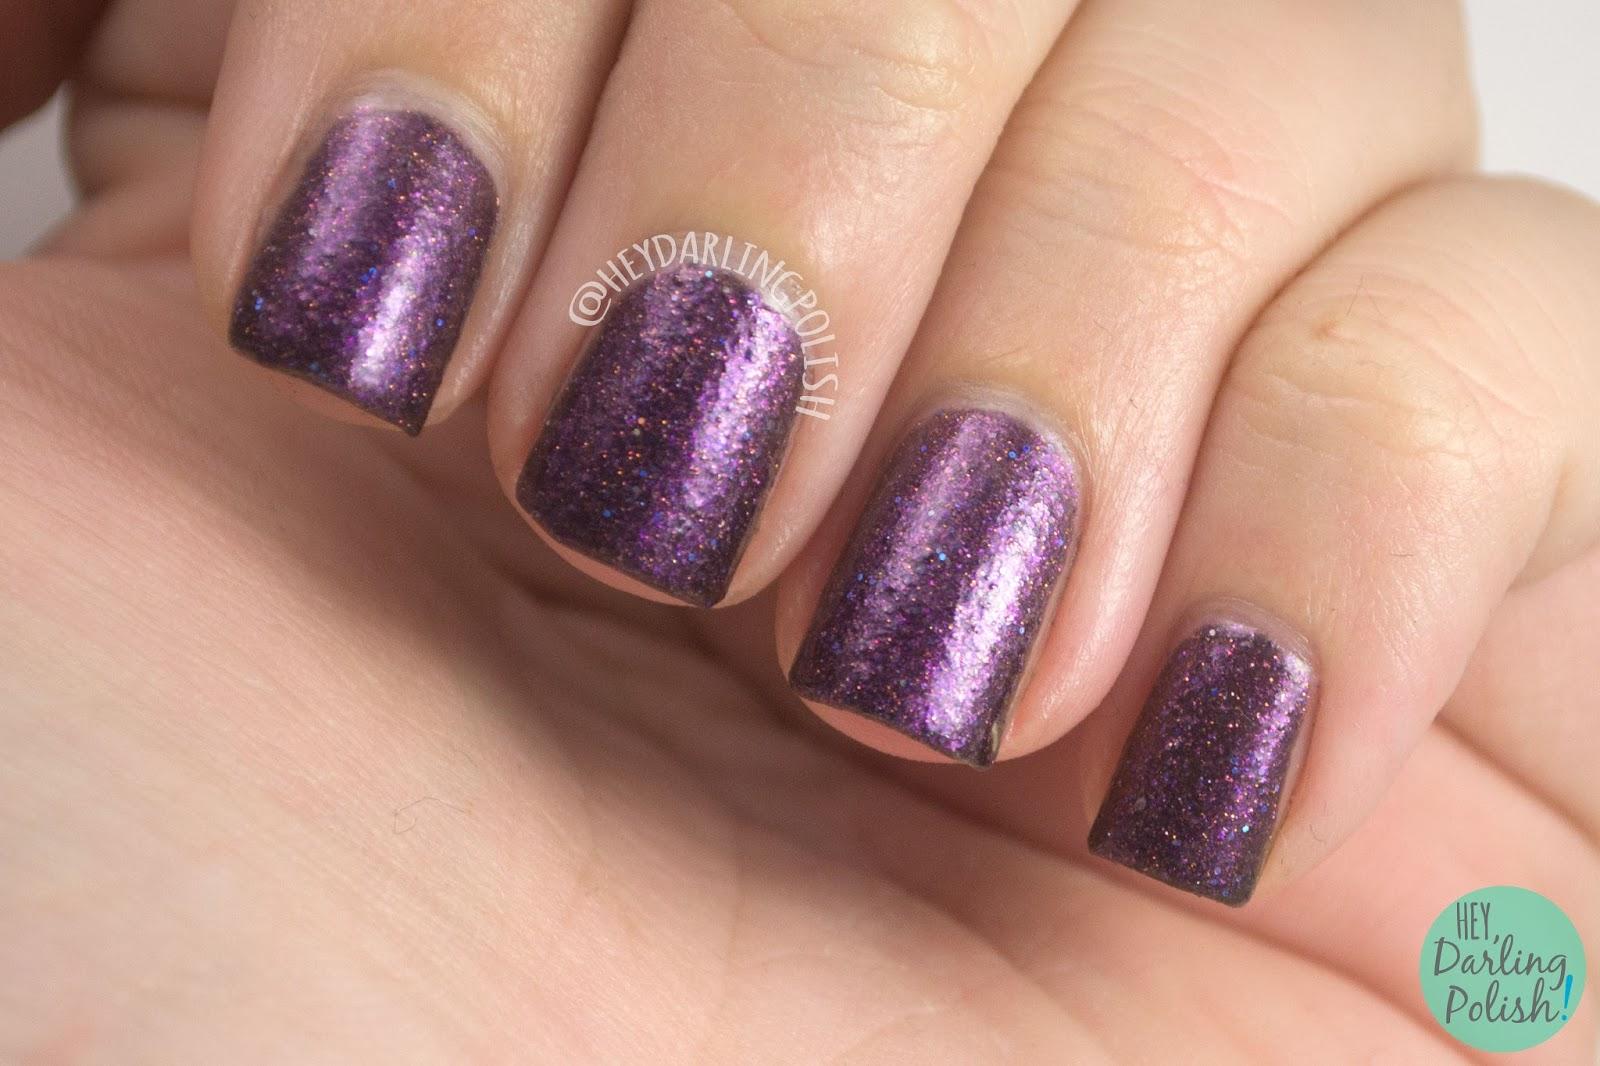 flor de muerto, purple, plum, glitter, halloween, nails, nail polish, indie polish, indie nail polish, hey darling polish, black dahlia lacquer,